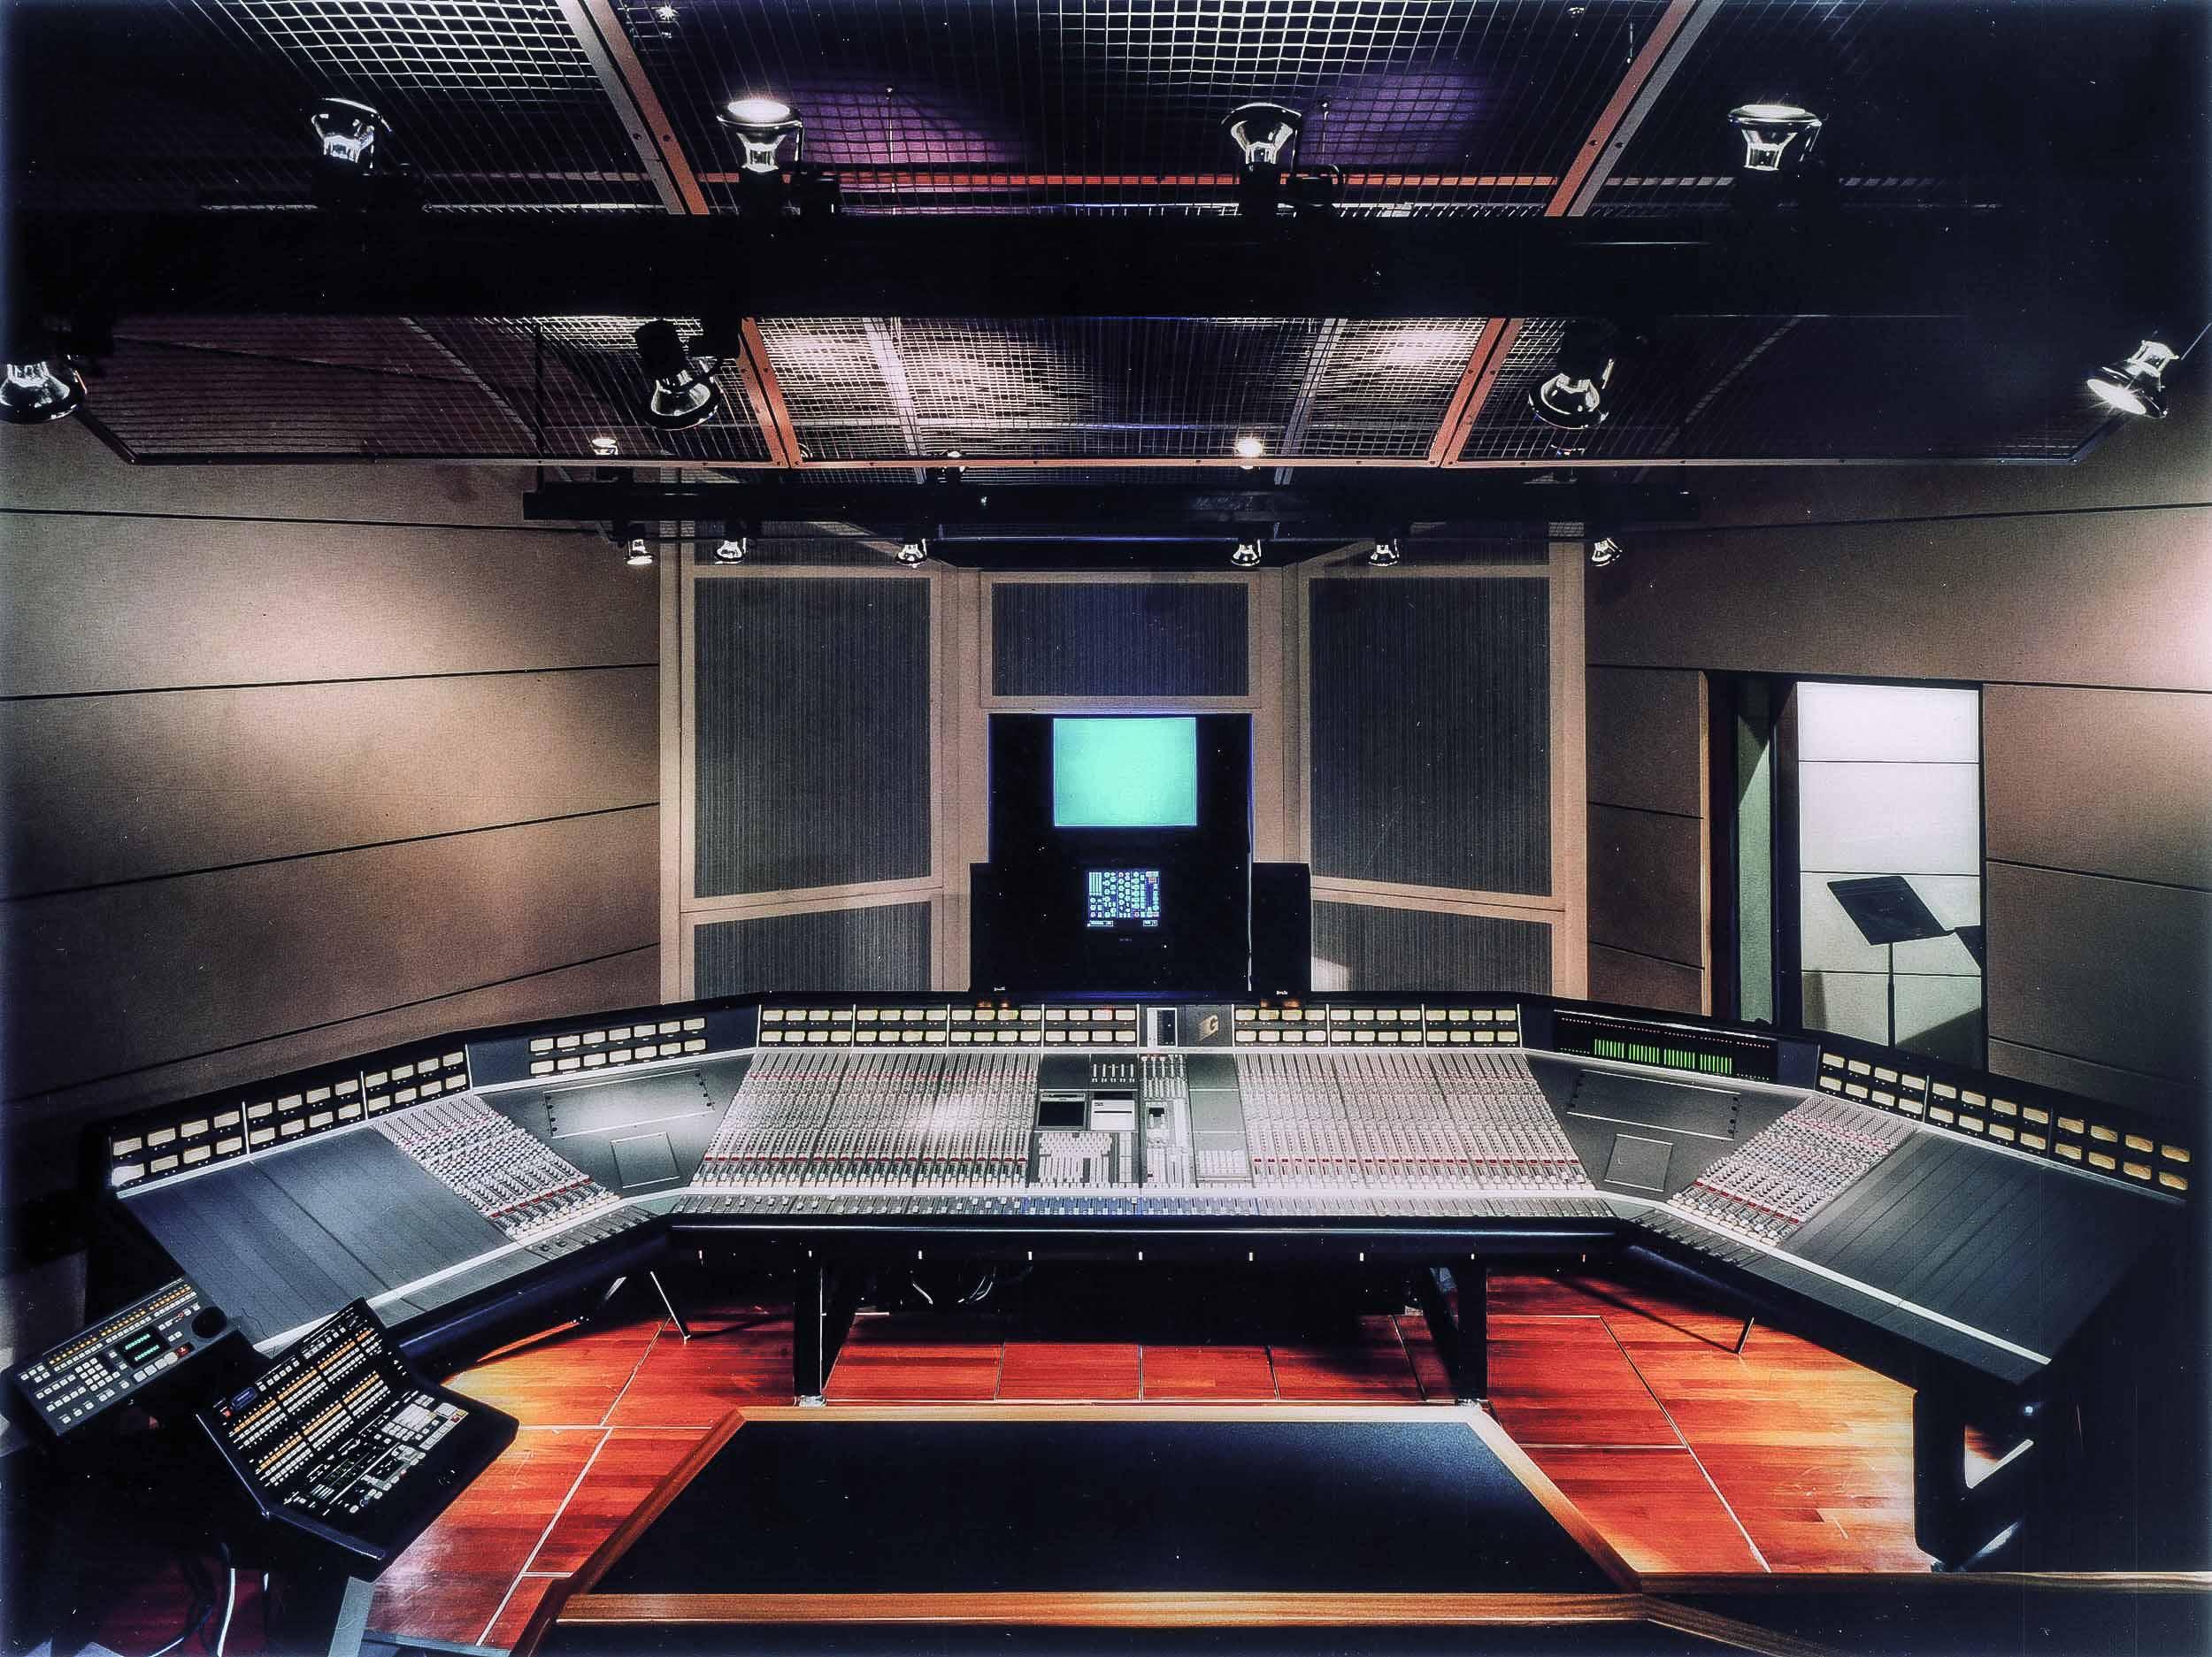 SONY ENTERTAINMENT DESIGN-BUILD CONSTRUCTION PROJECT